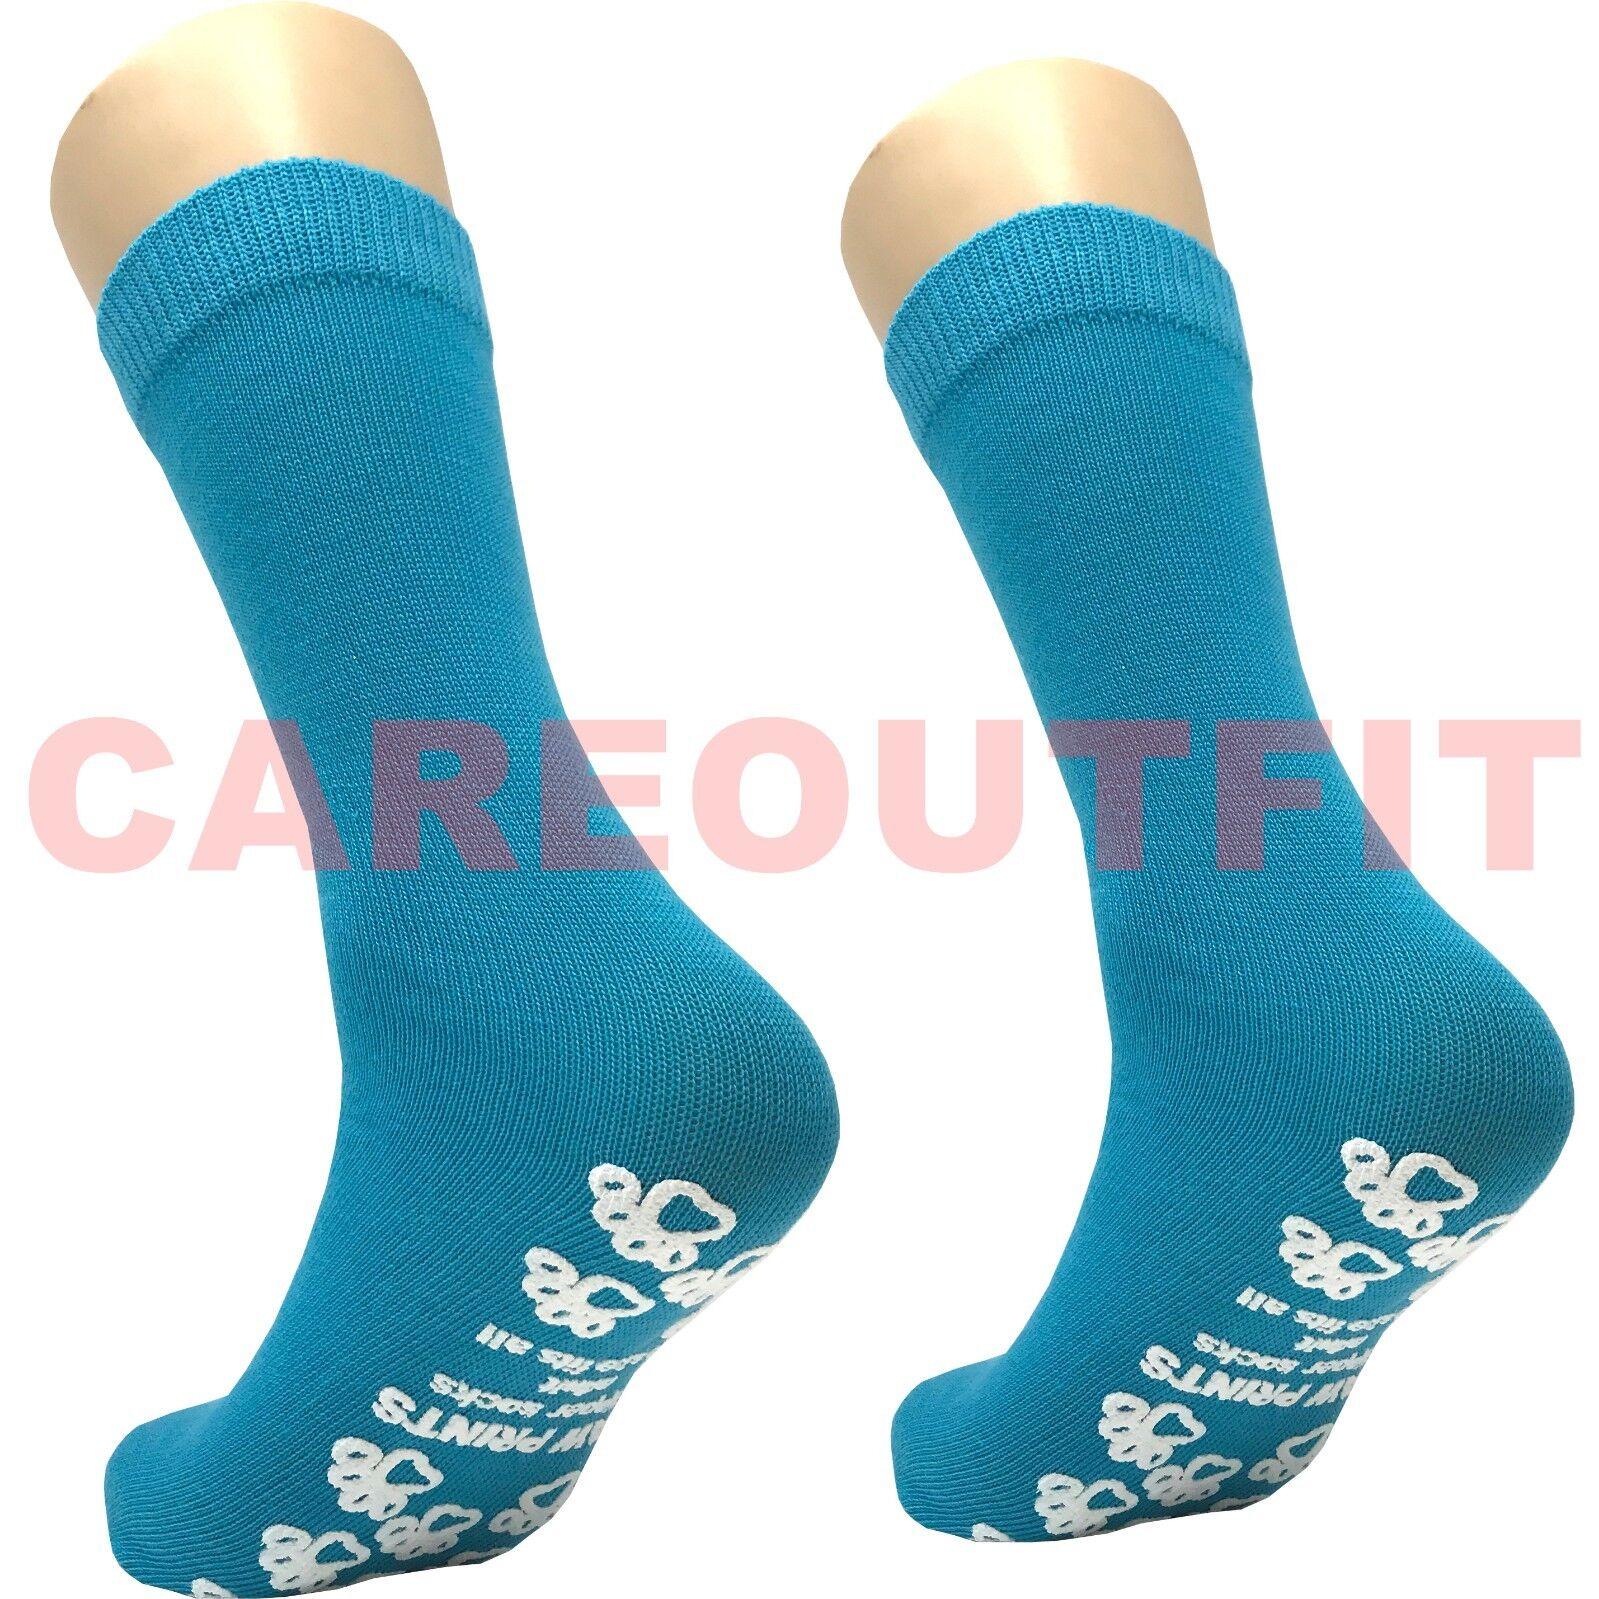 Non Slip Slipper Socks One Size Fits Most - Hospital Grade -